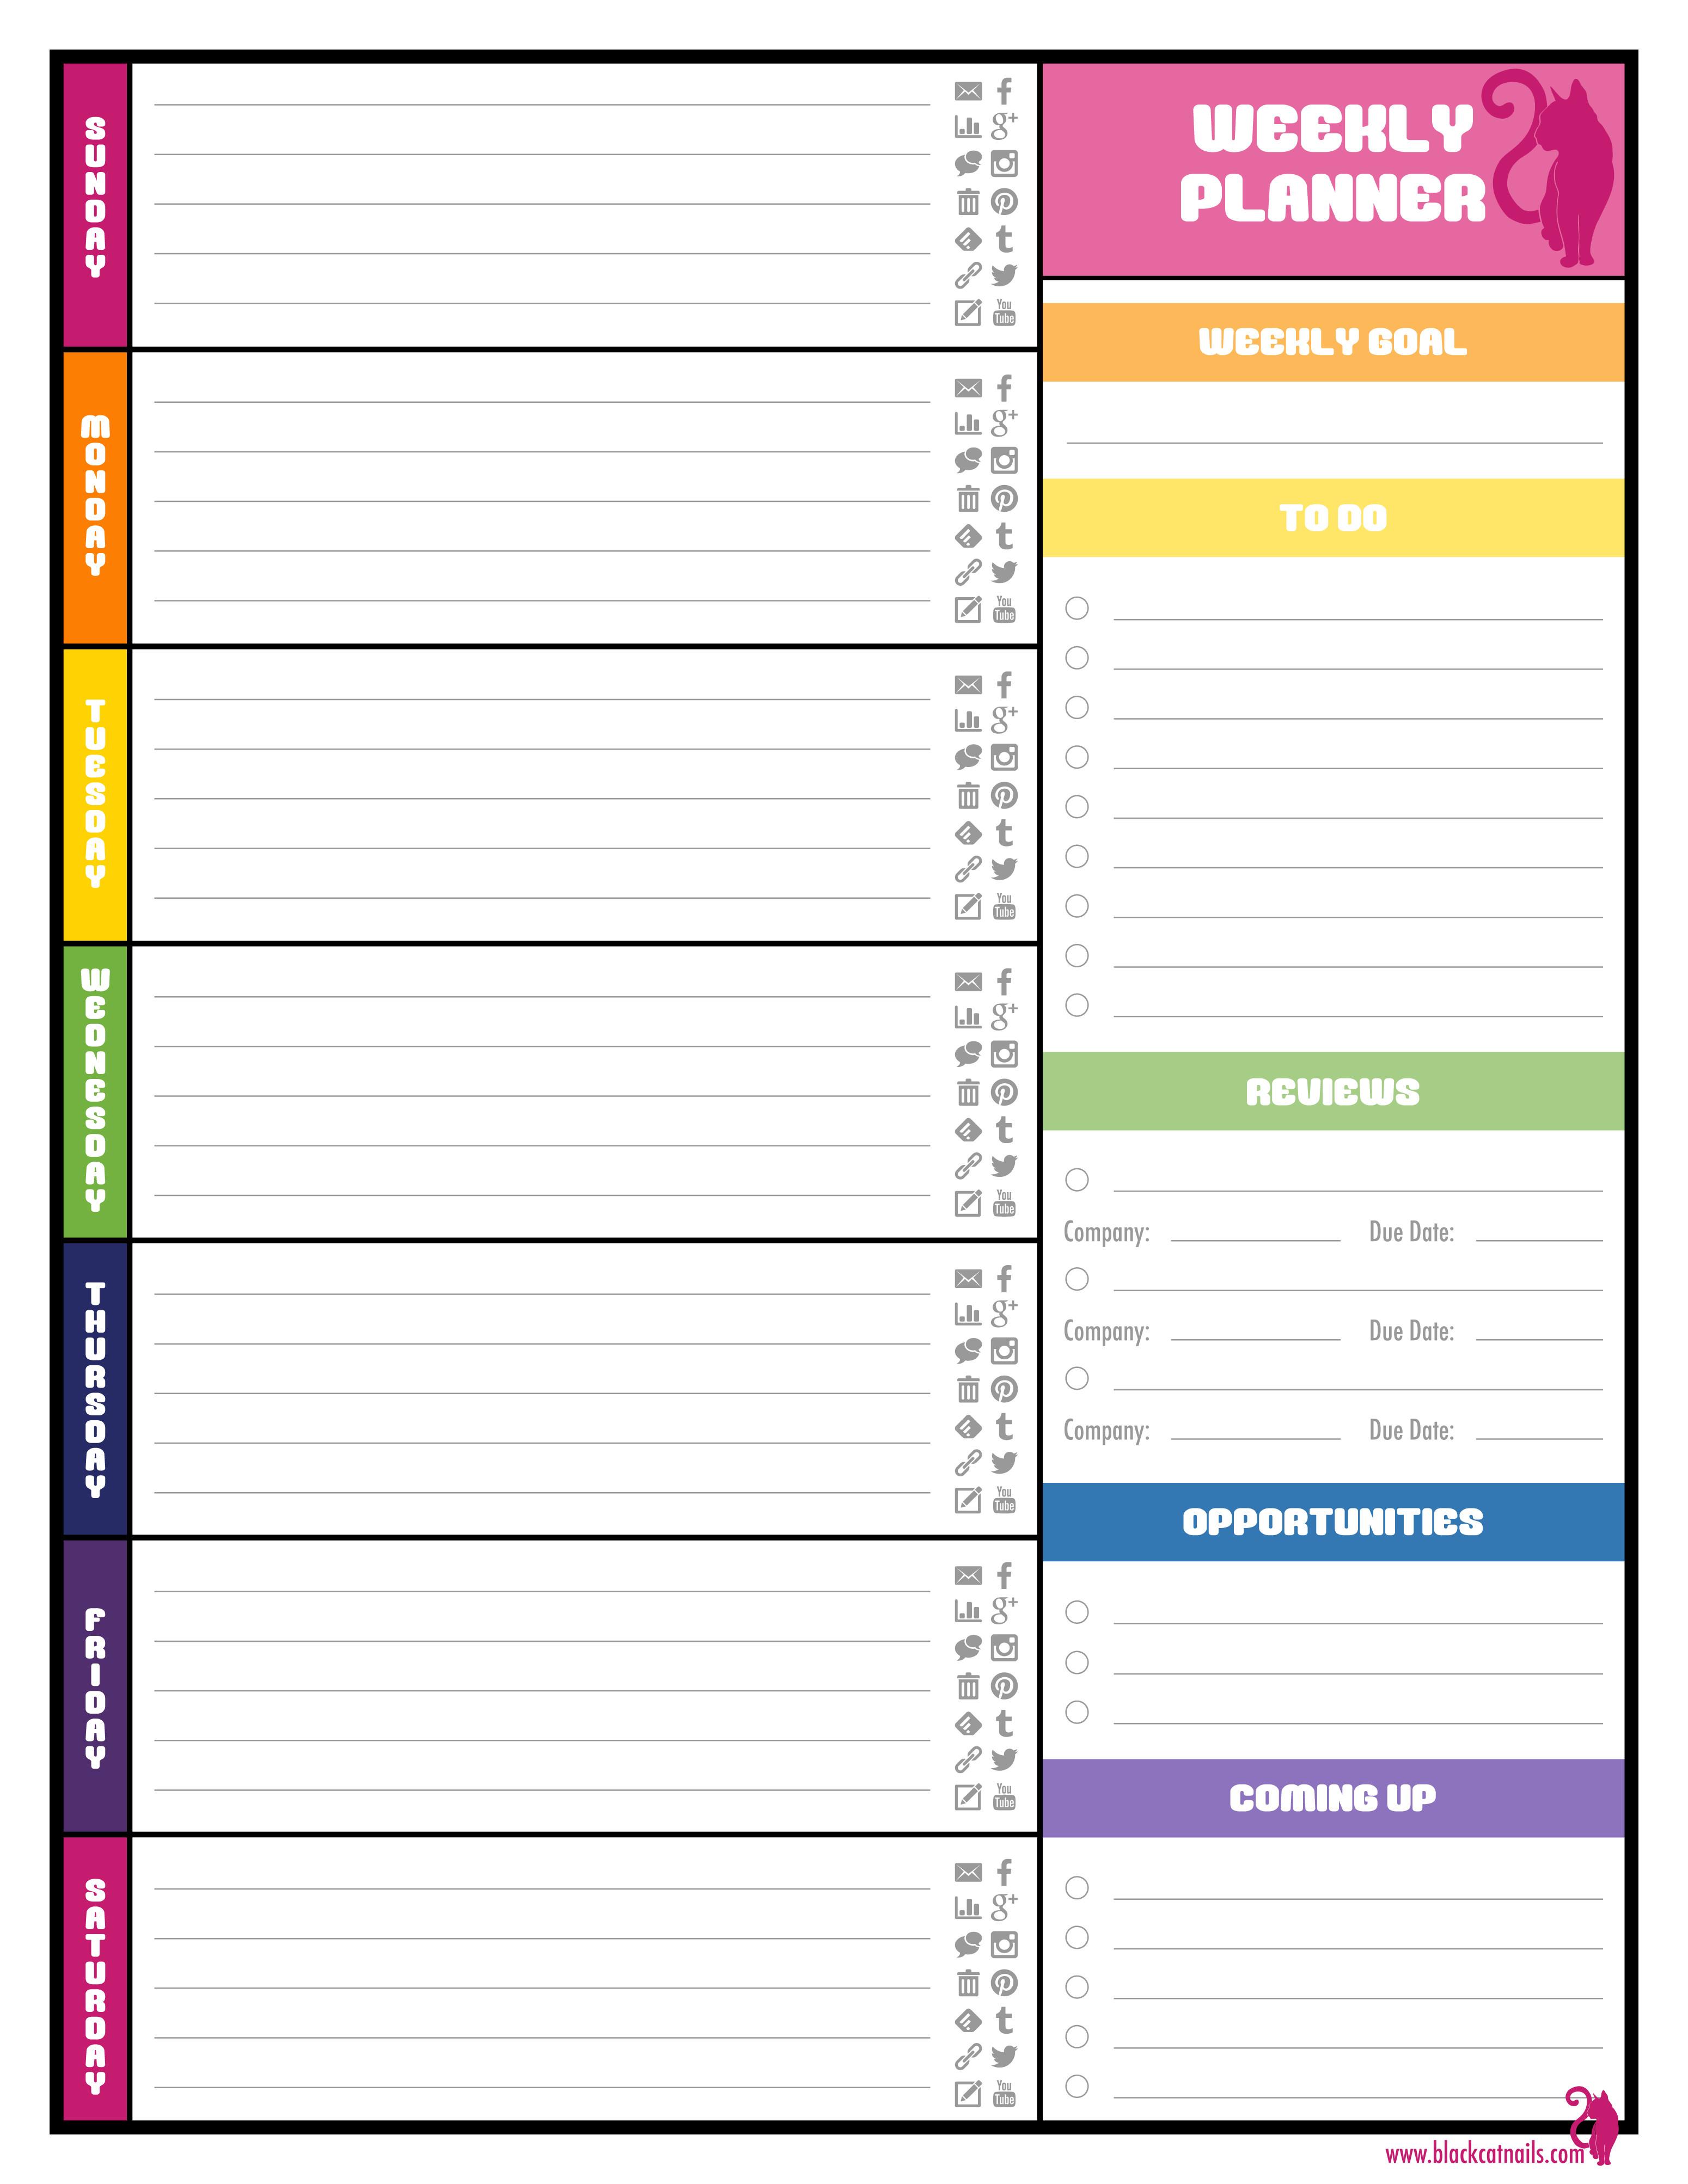 Weekly School Planner Template Colorful Weekly Blogging Planner Image